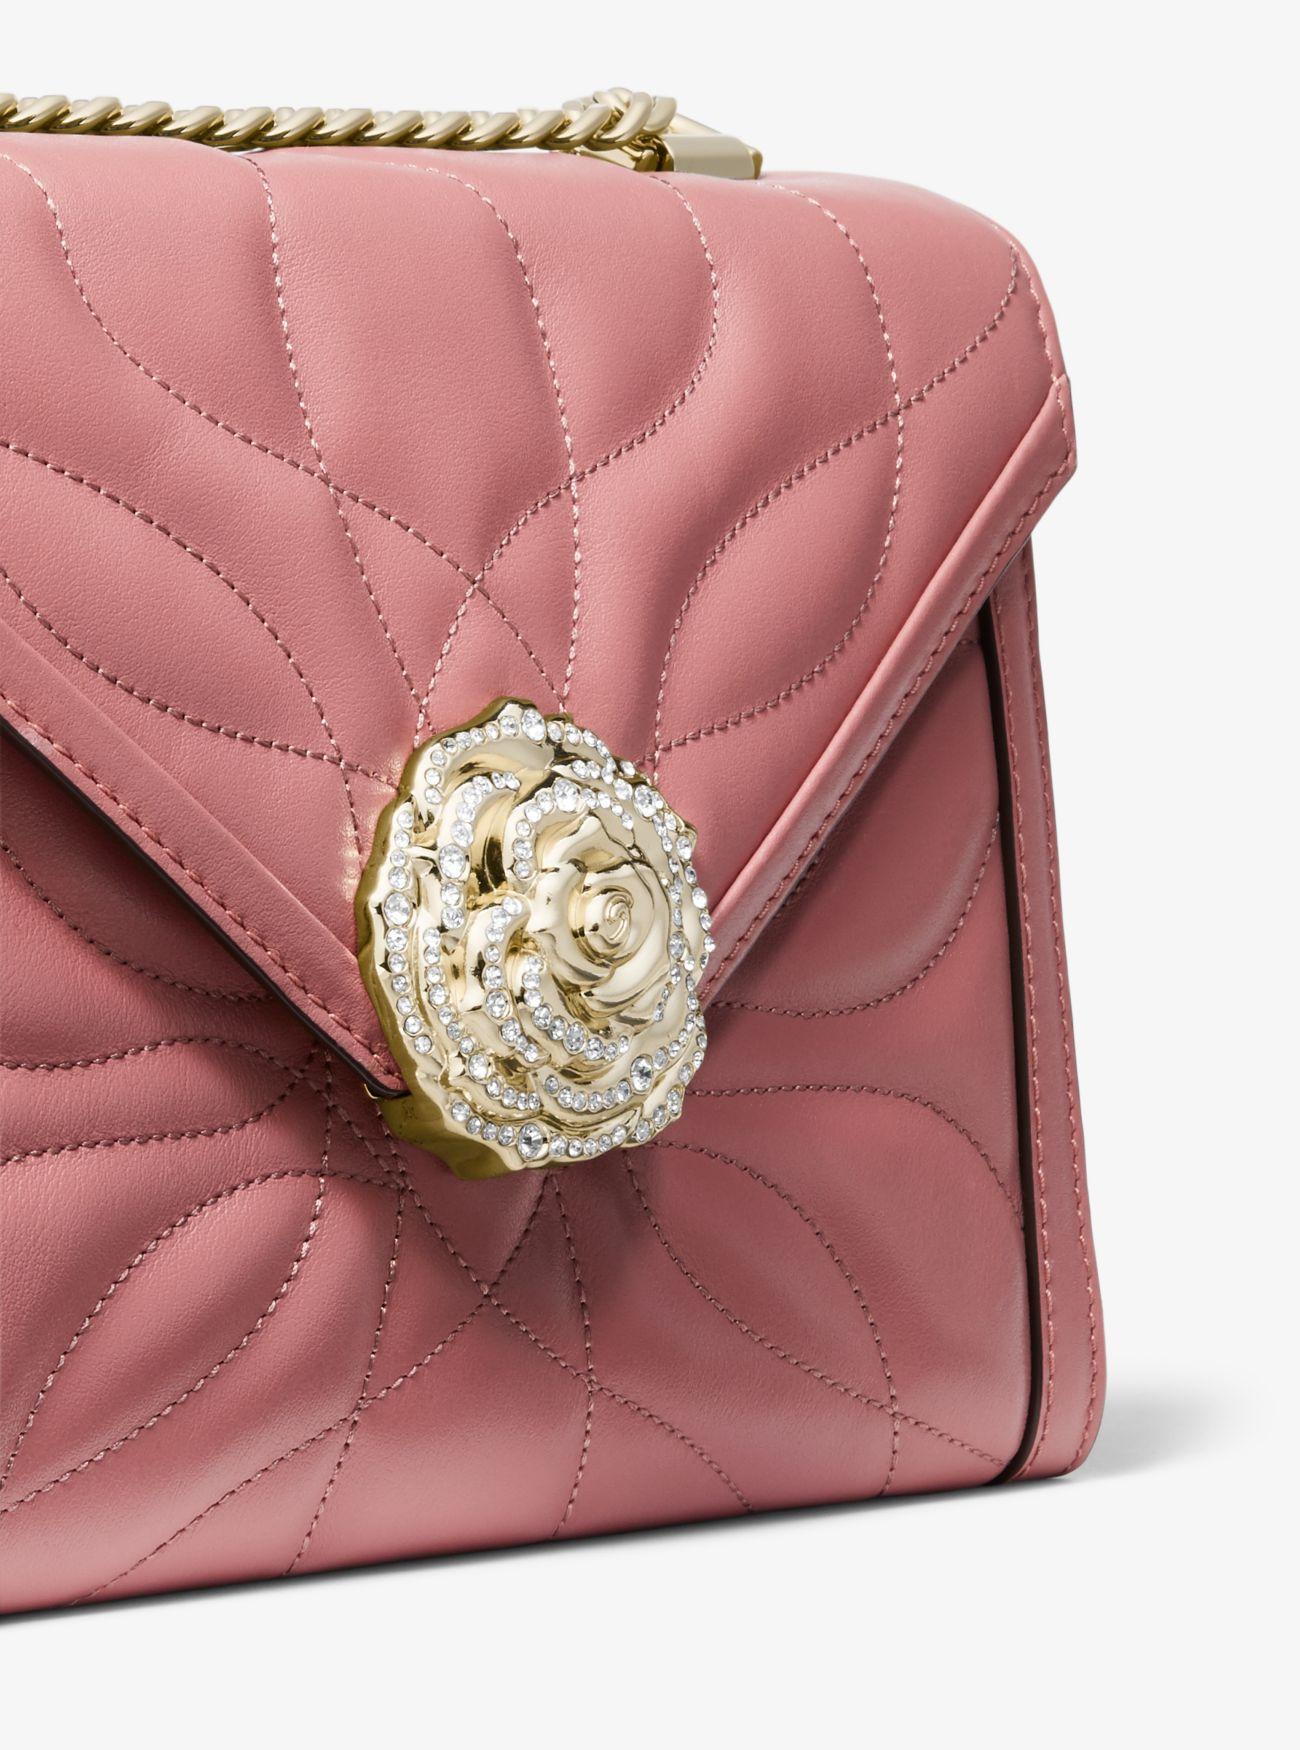 a905257f452d1d ... Whitney Large Petal Quilted Leather Convertible Shoulder Bag. MICHAEL  Michael Kors